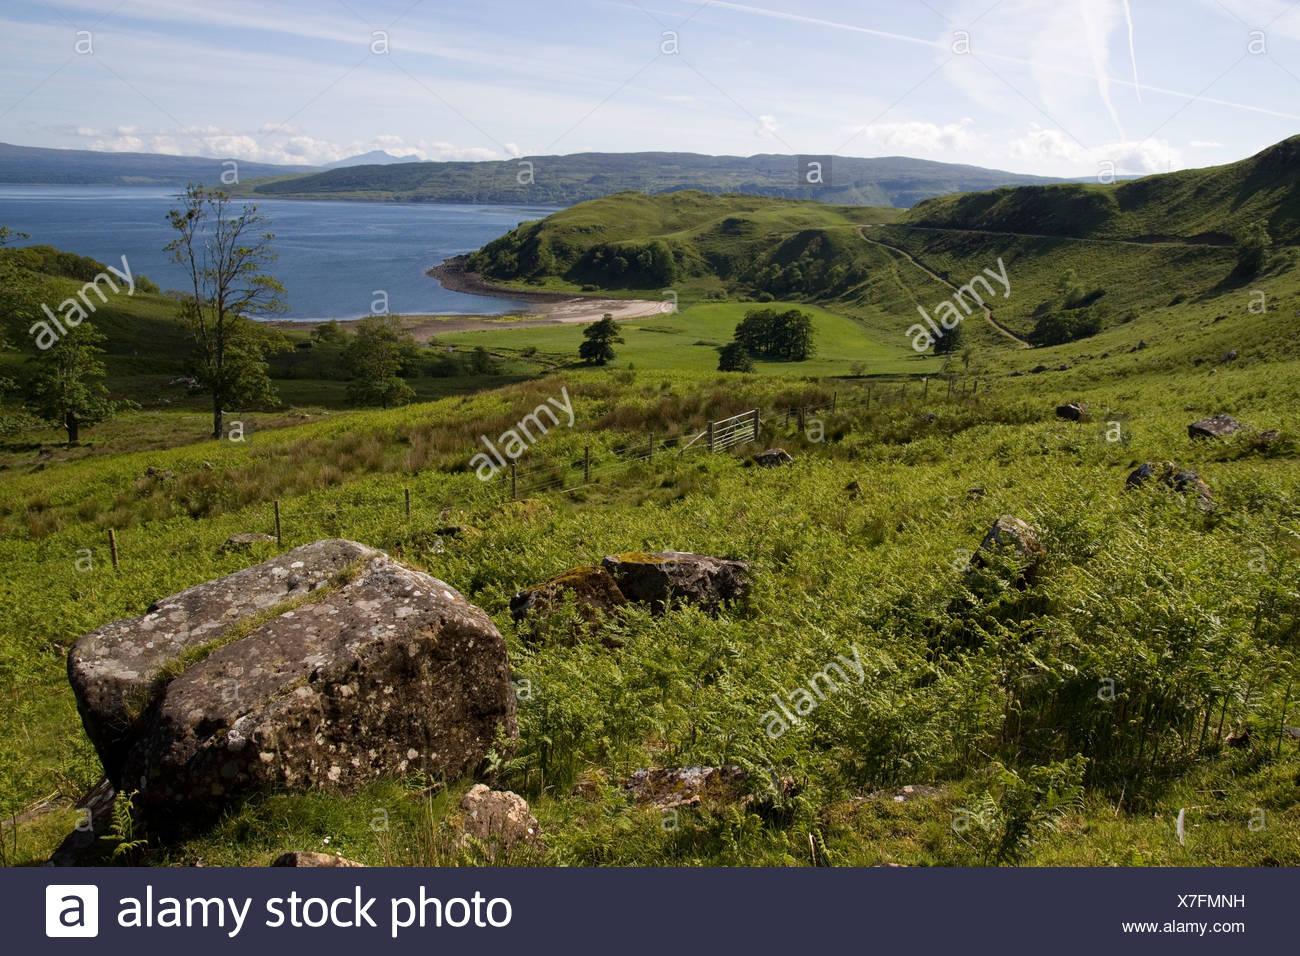 Scotland, Ardnamurchan, Salen Bay on Loch Sunart - Stock Image